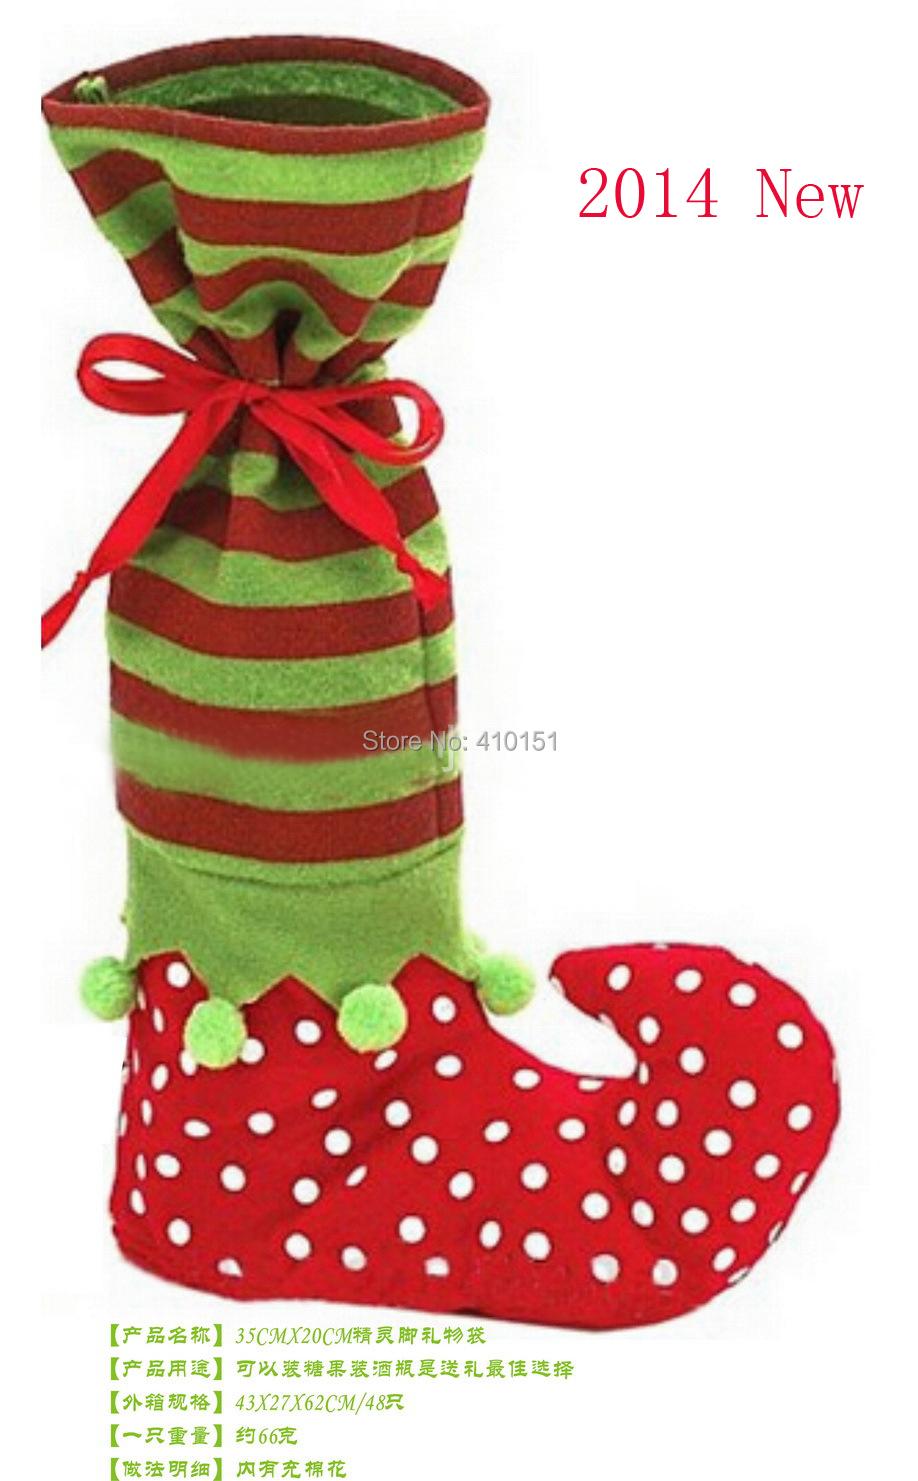 2014 Hot!!! OEM Christmas articles 200PCS 35cm*20cm Christmas gift bag, candy bag for Christmas(China (Mainland))